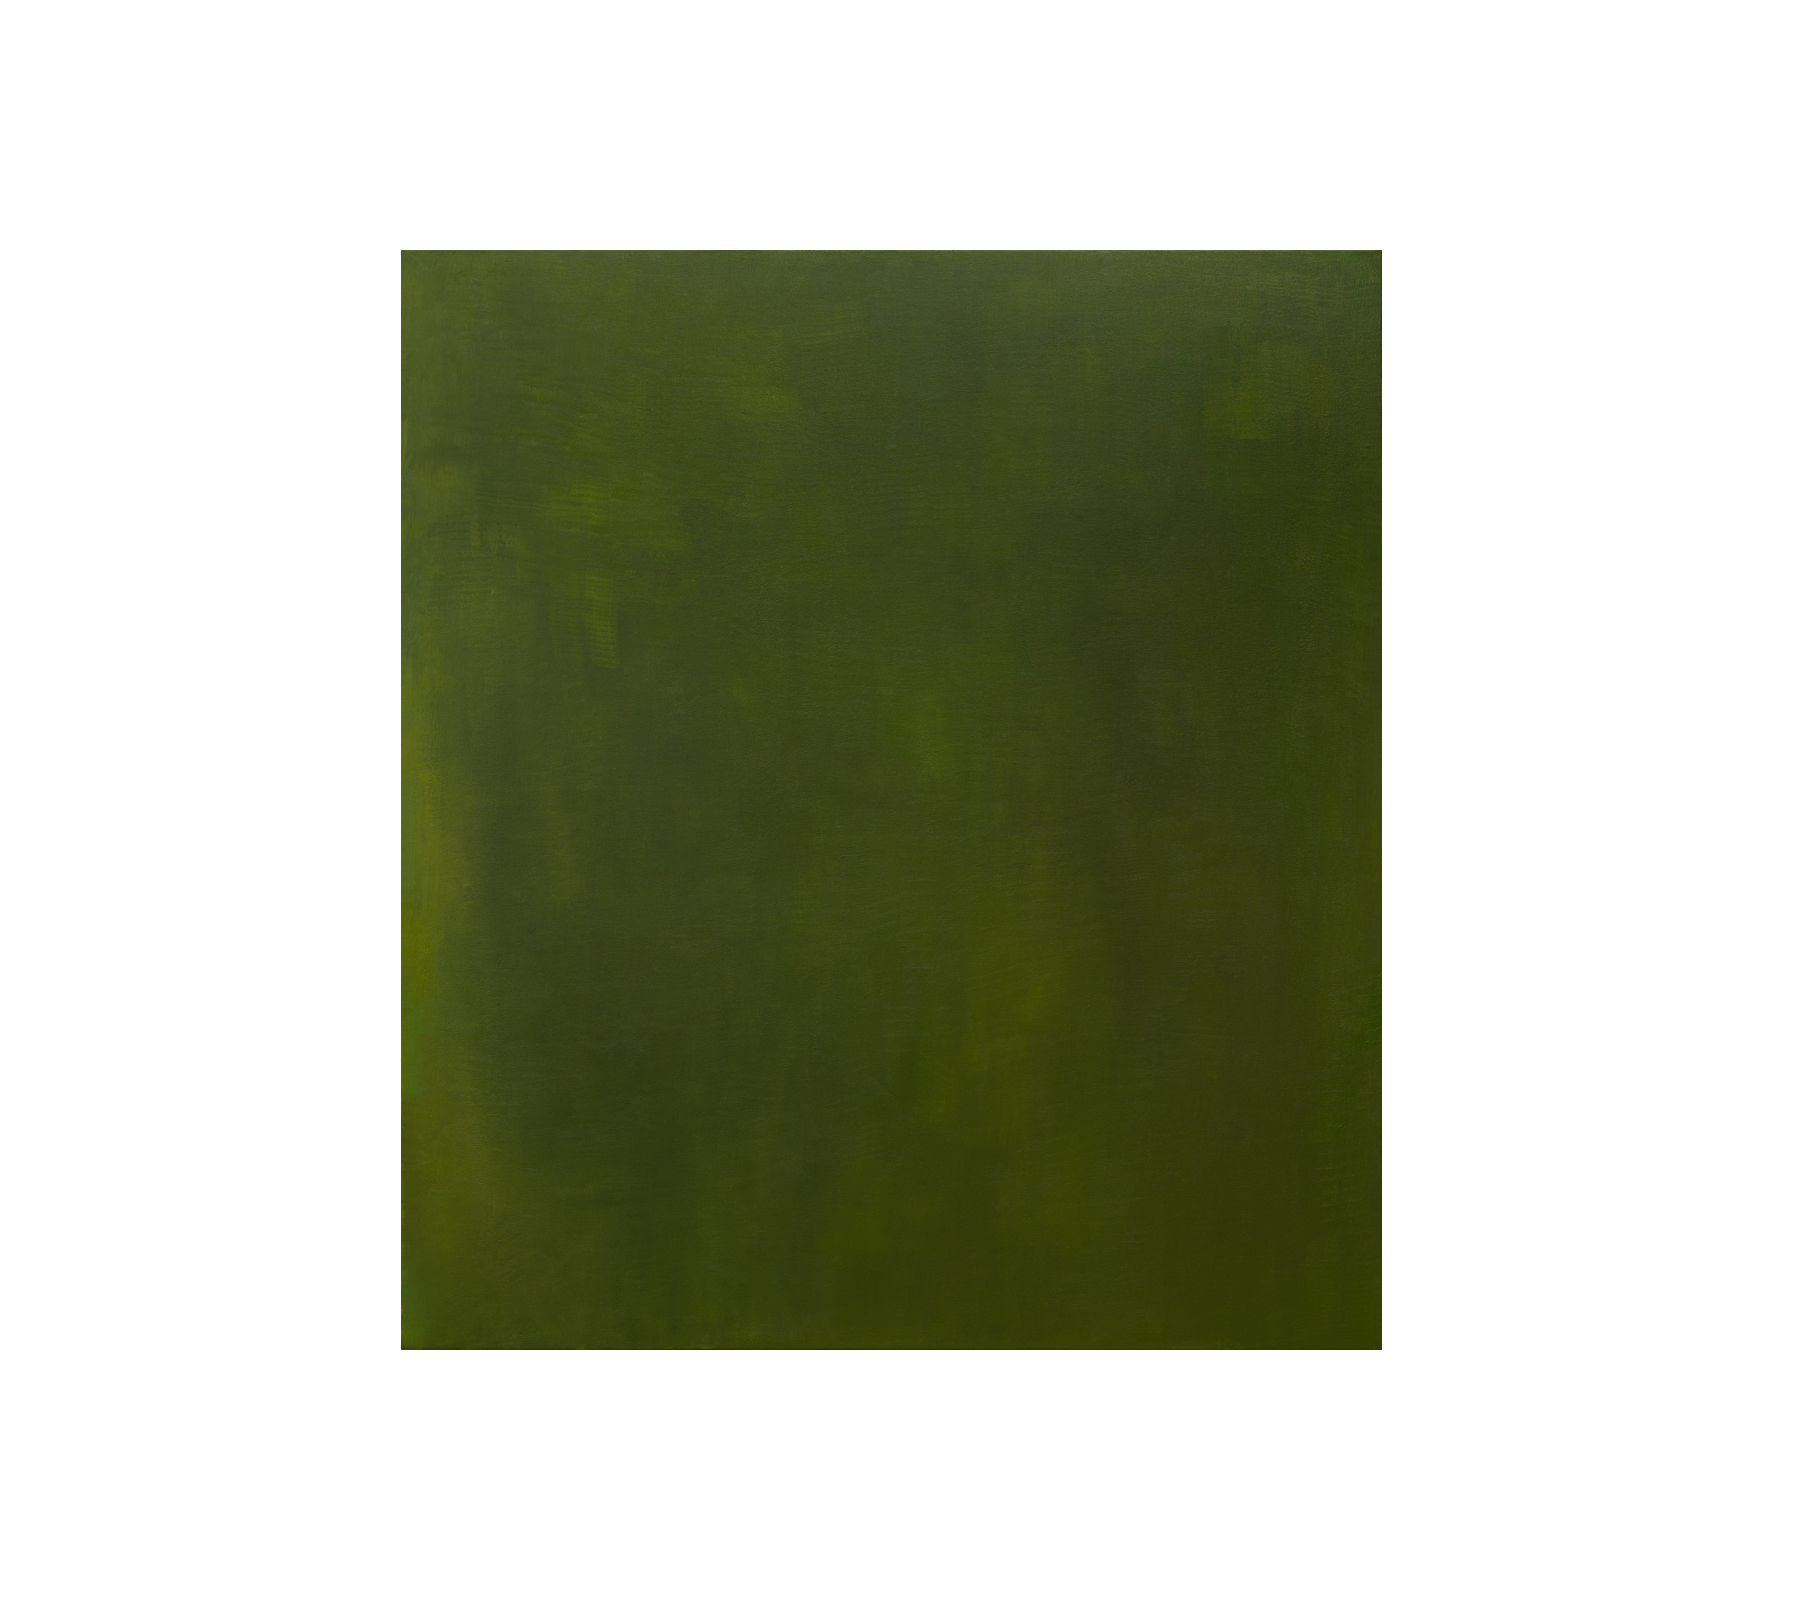 Fall 2020 180x160cm